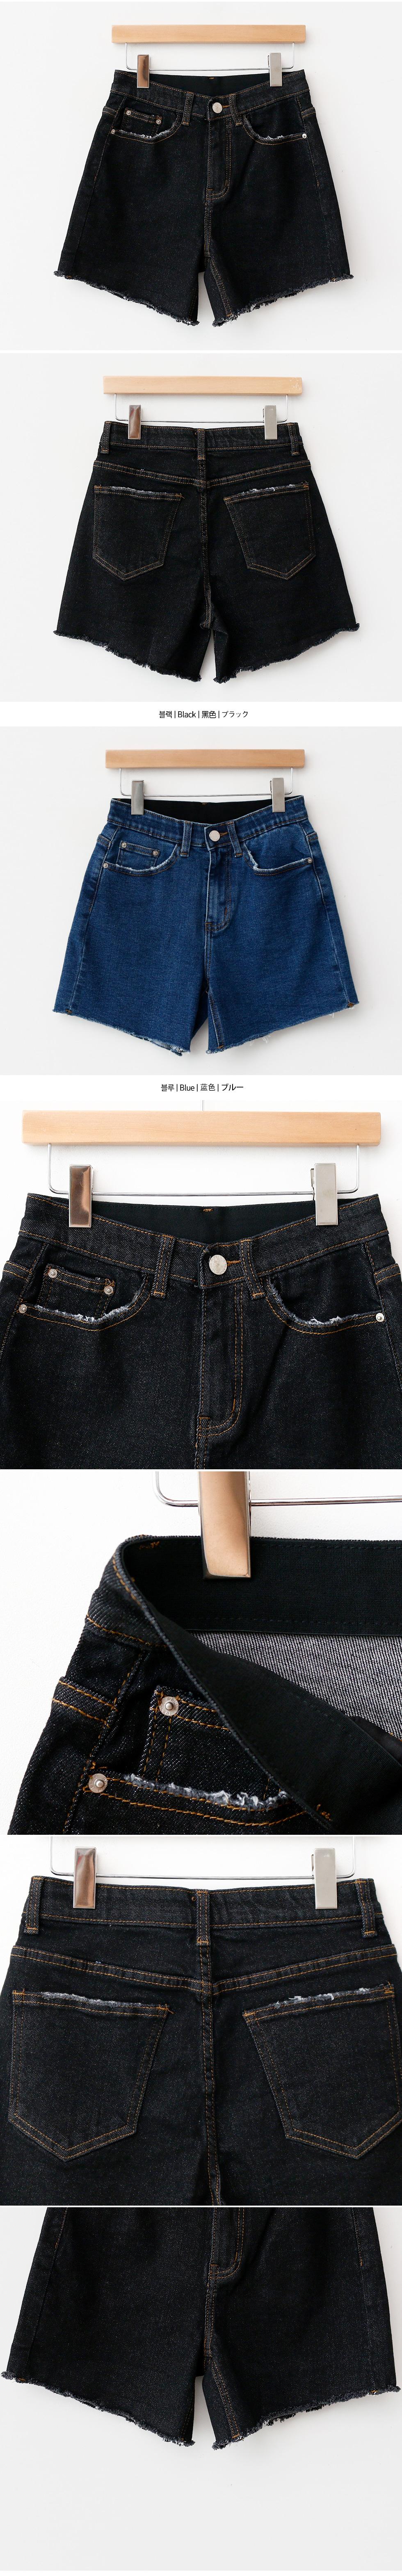 Dutch Line Band Shorts